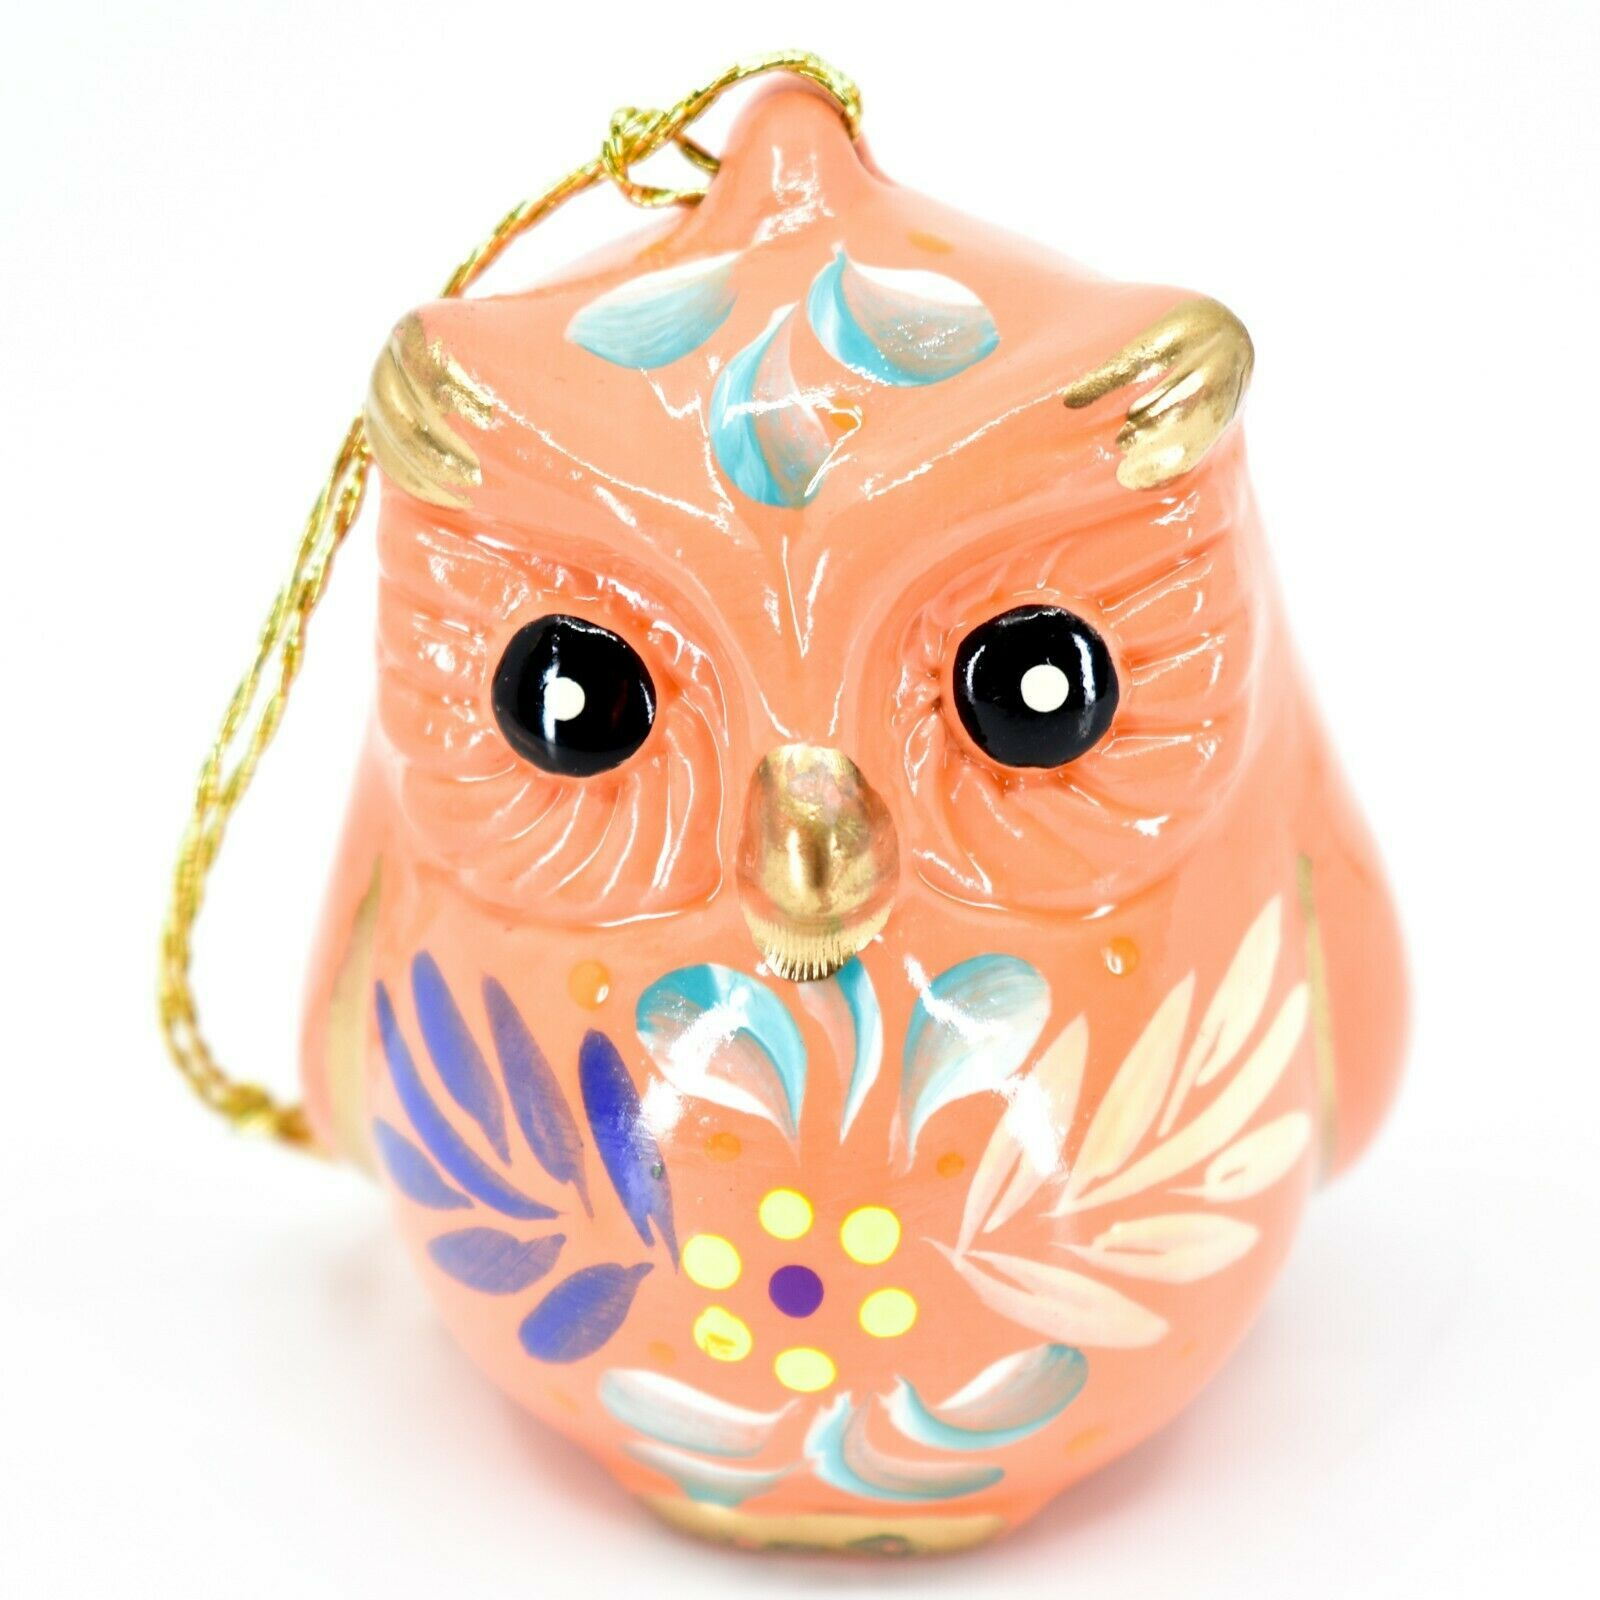 Handcrafted Painted Ceramic Peach Pink Owl Confetti Ornament Made in Peru